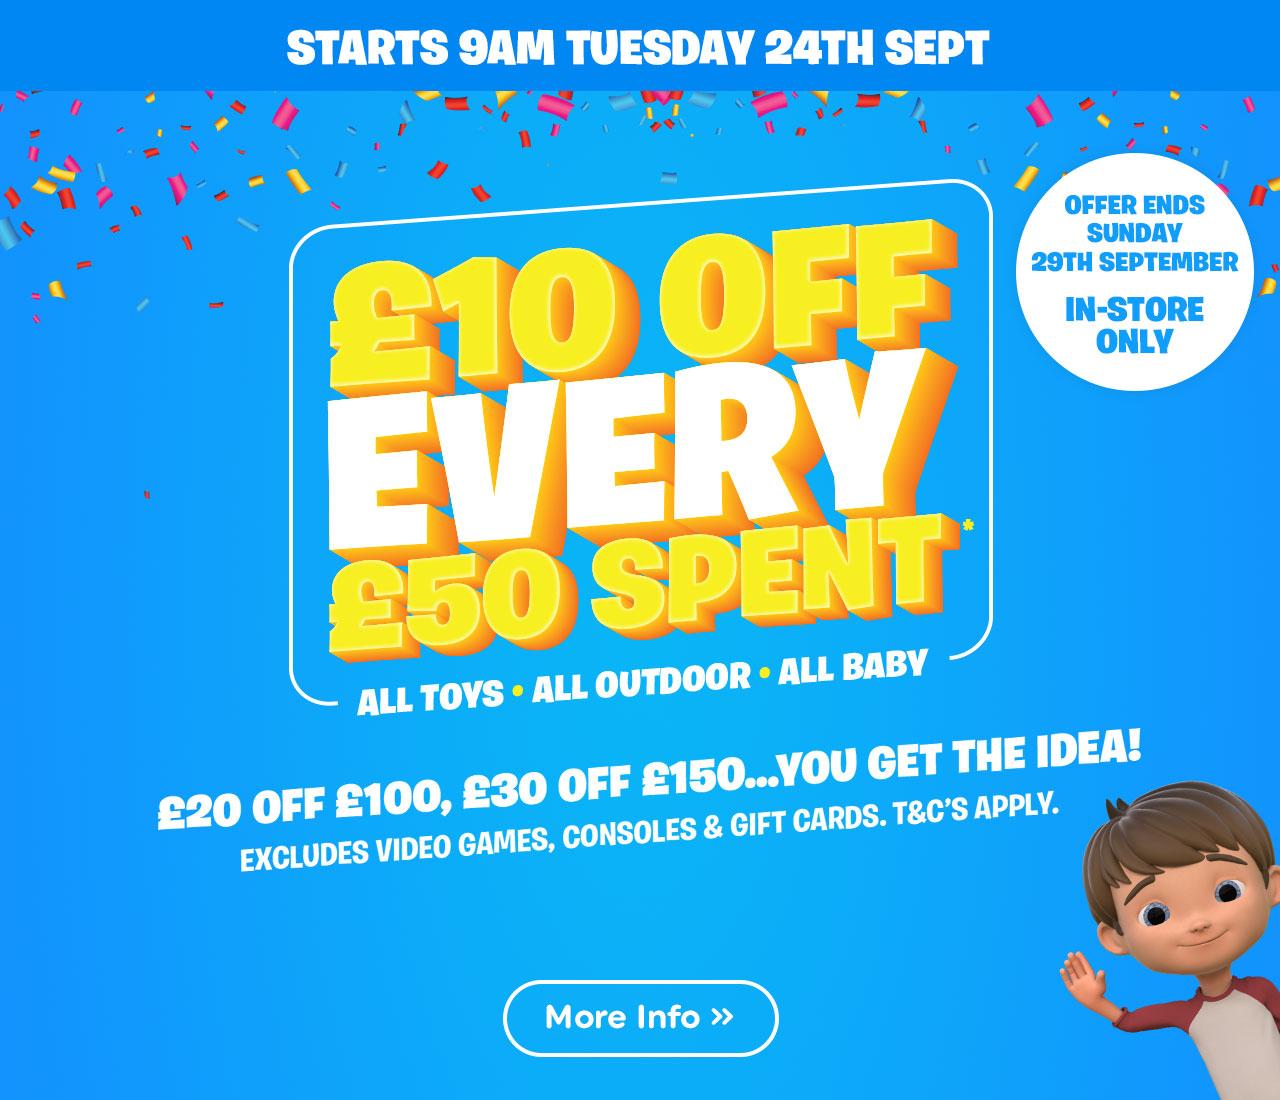 Smyths Toys Offer